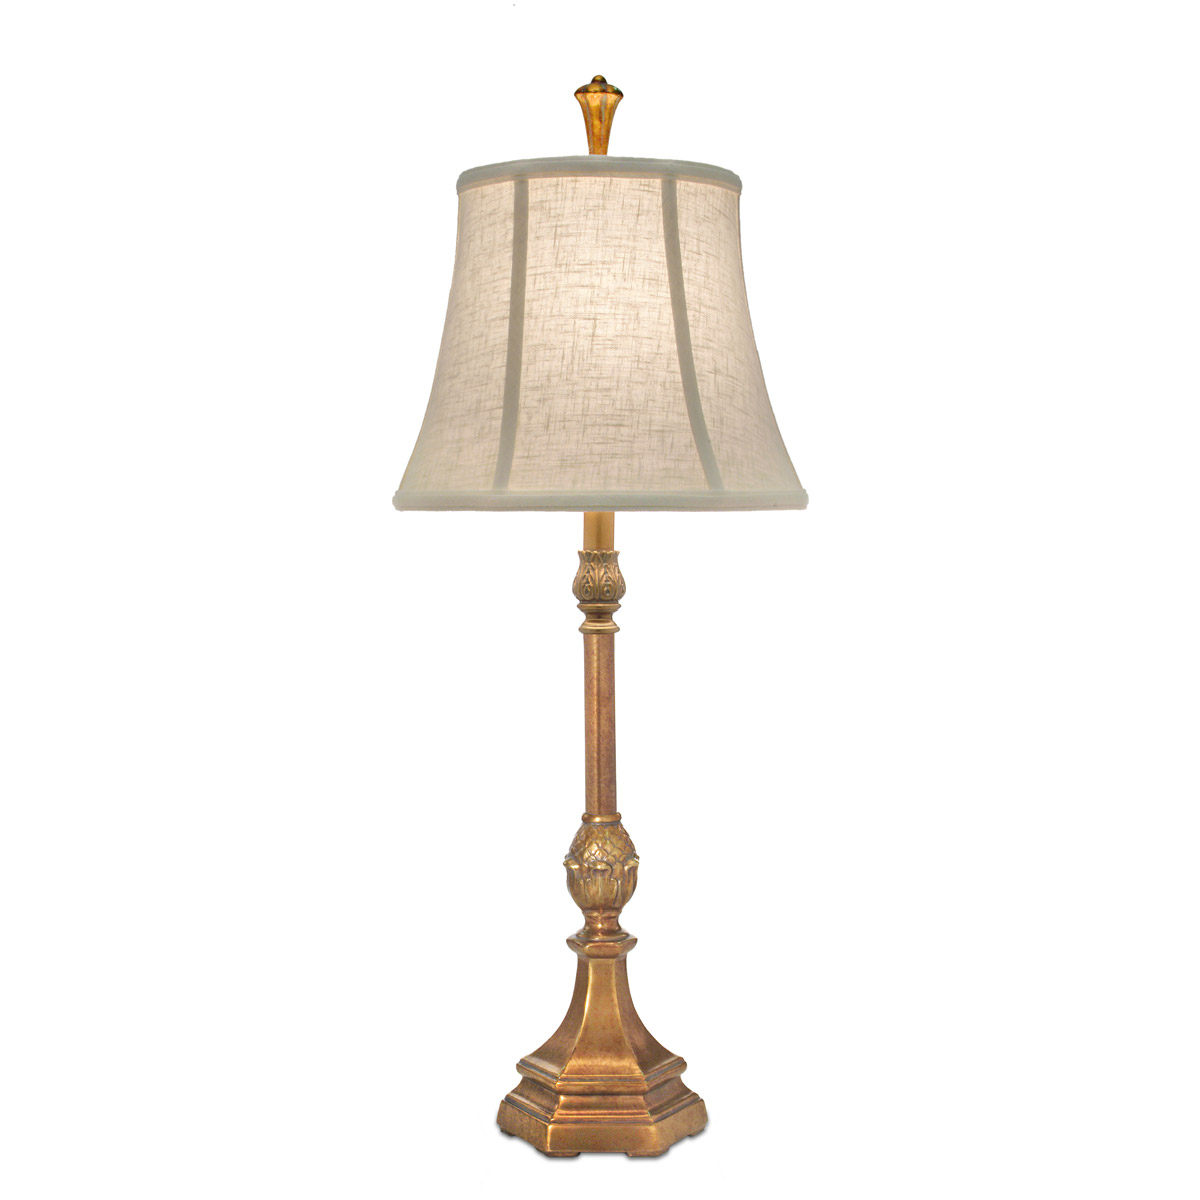 Stiffel lamps bl 6736 k9019 phb signature table lamp polished honey brass